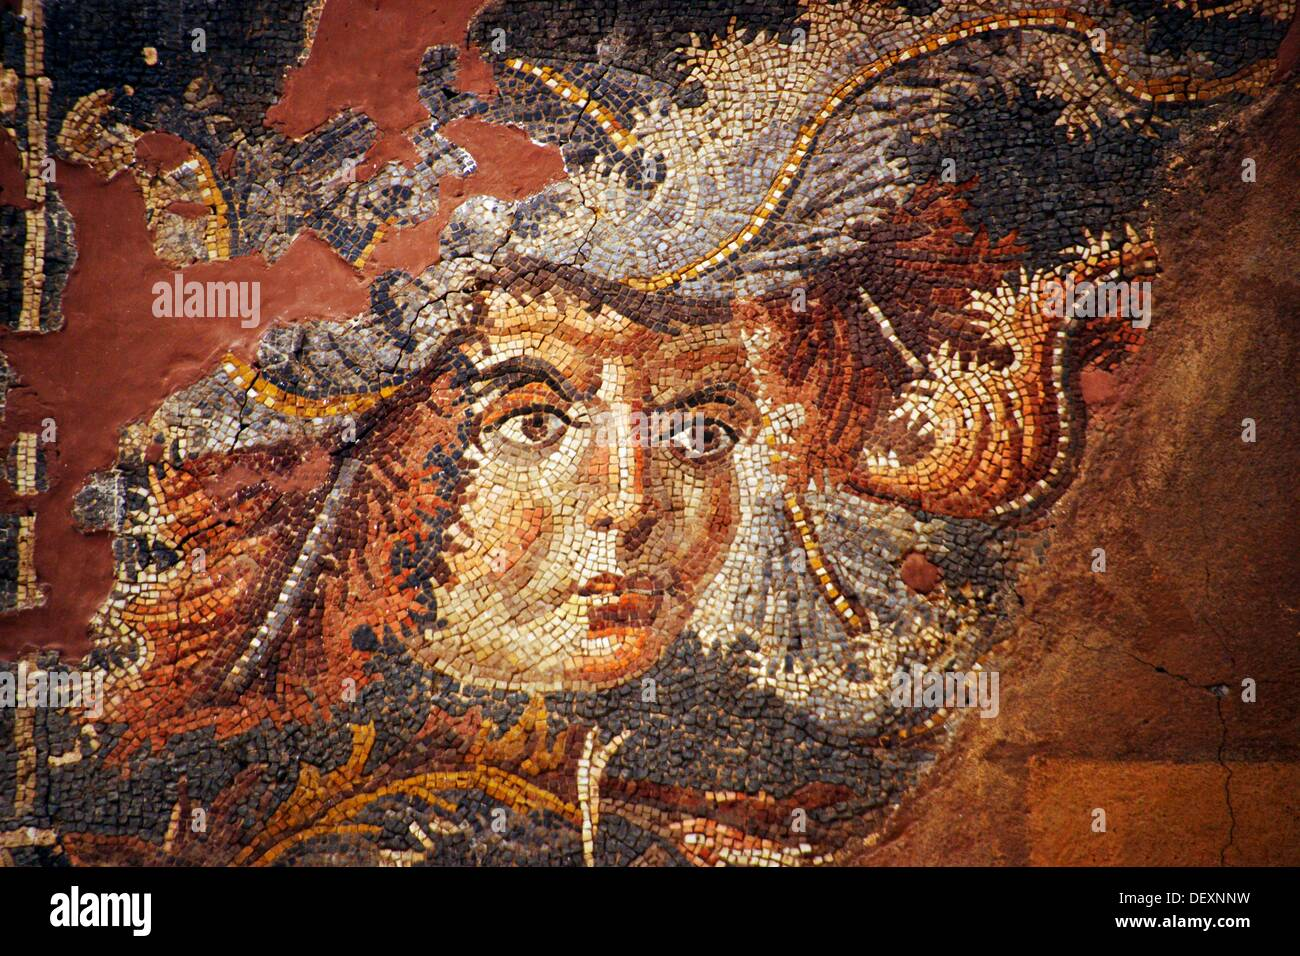 Detail on the mosaic of Bacchus and Ariadne (3rd century), Museum of Suweida, Suweida, Hauran, Syria - Stock Image